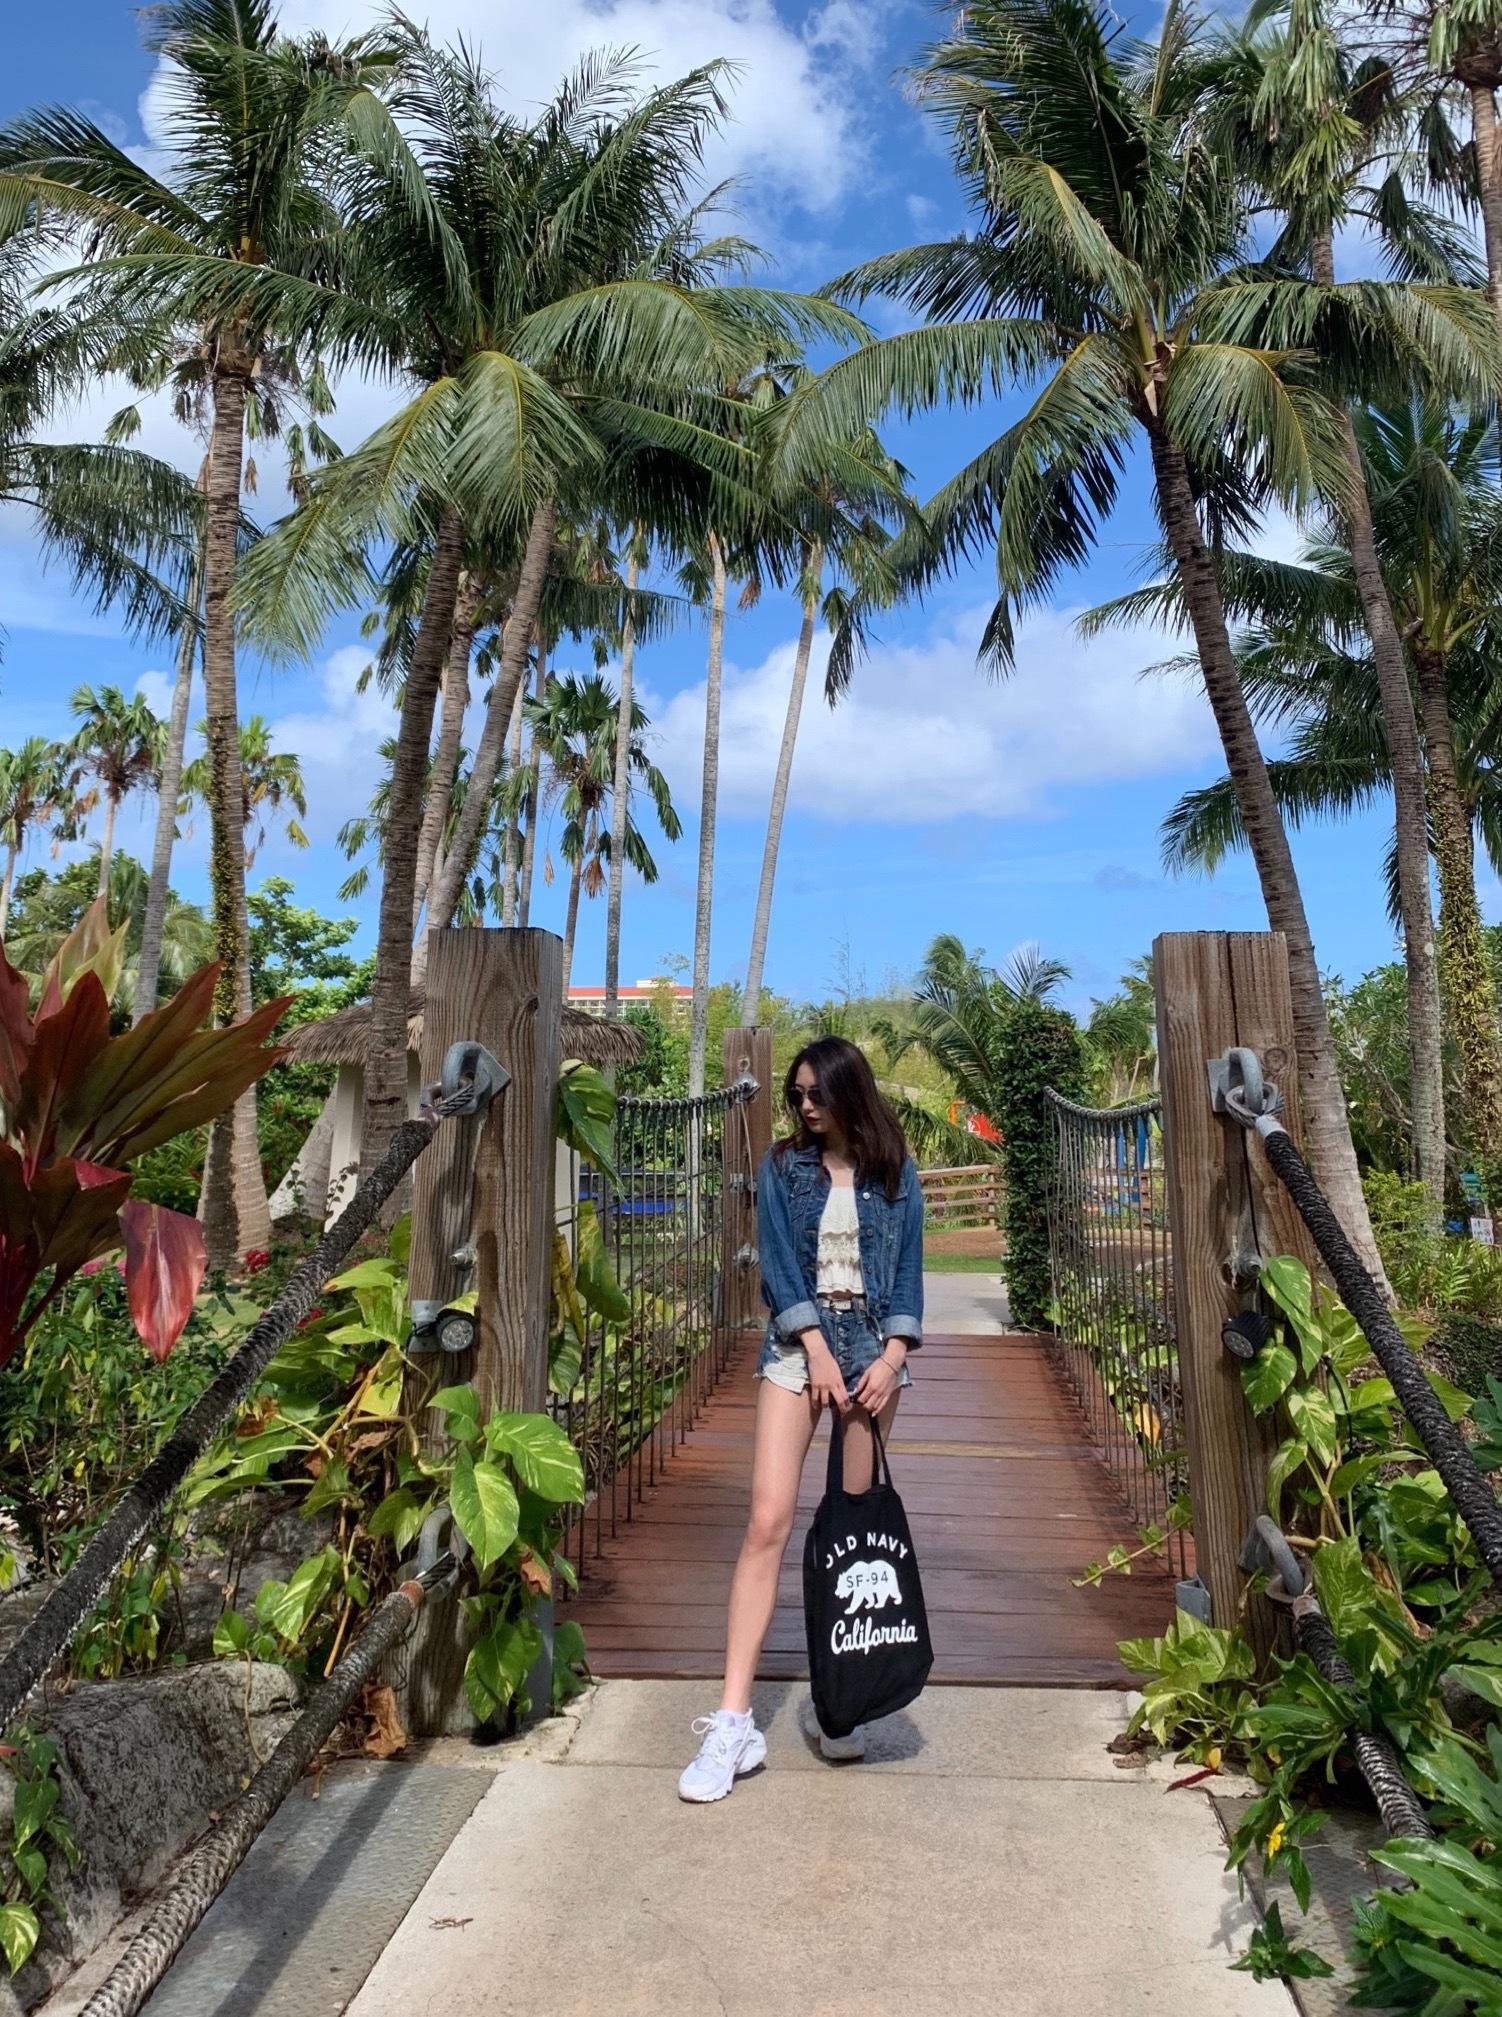 Guam旅行記☀︎_1_1